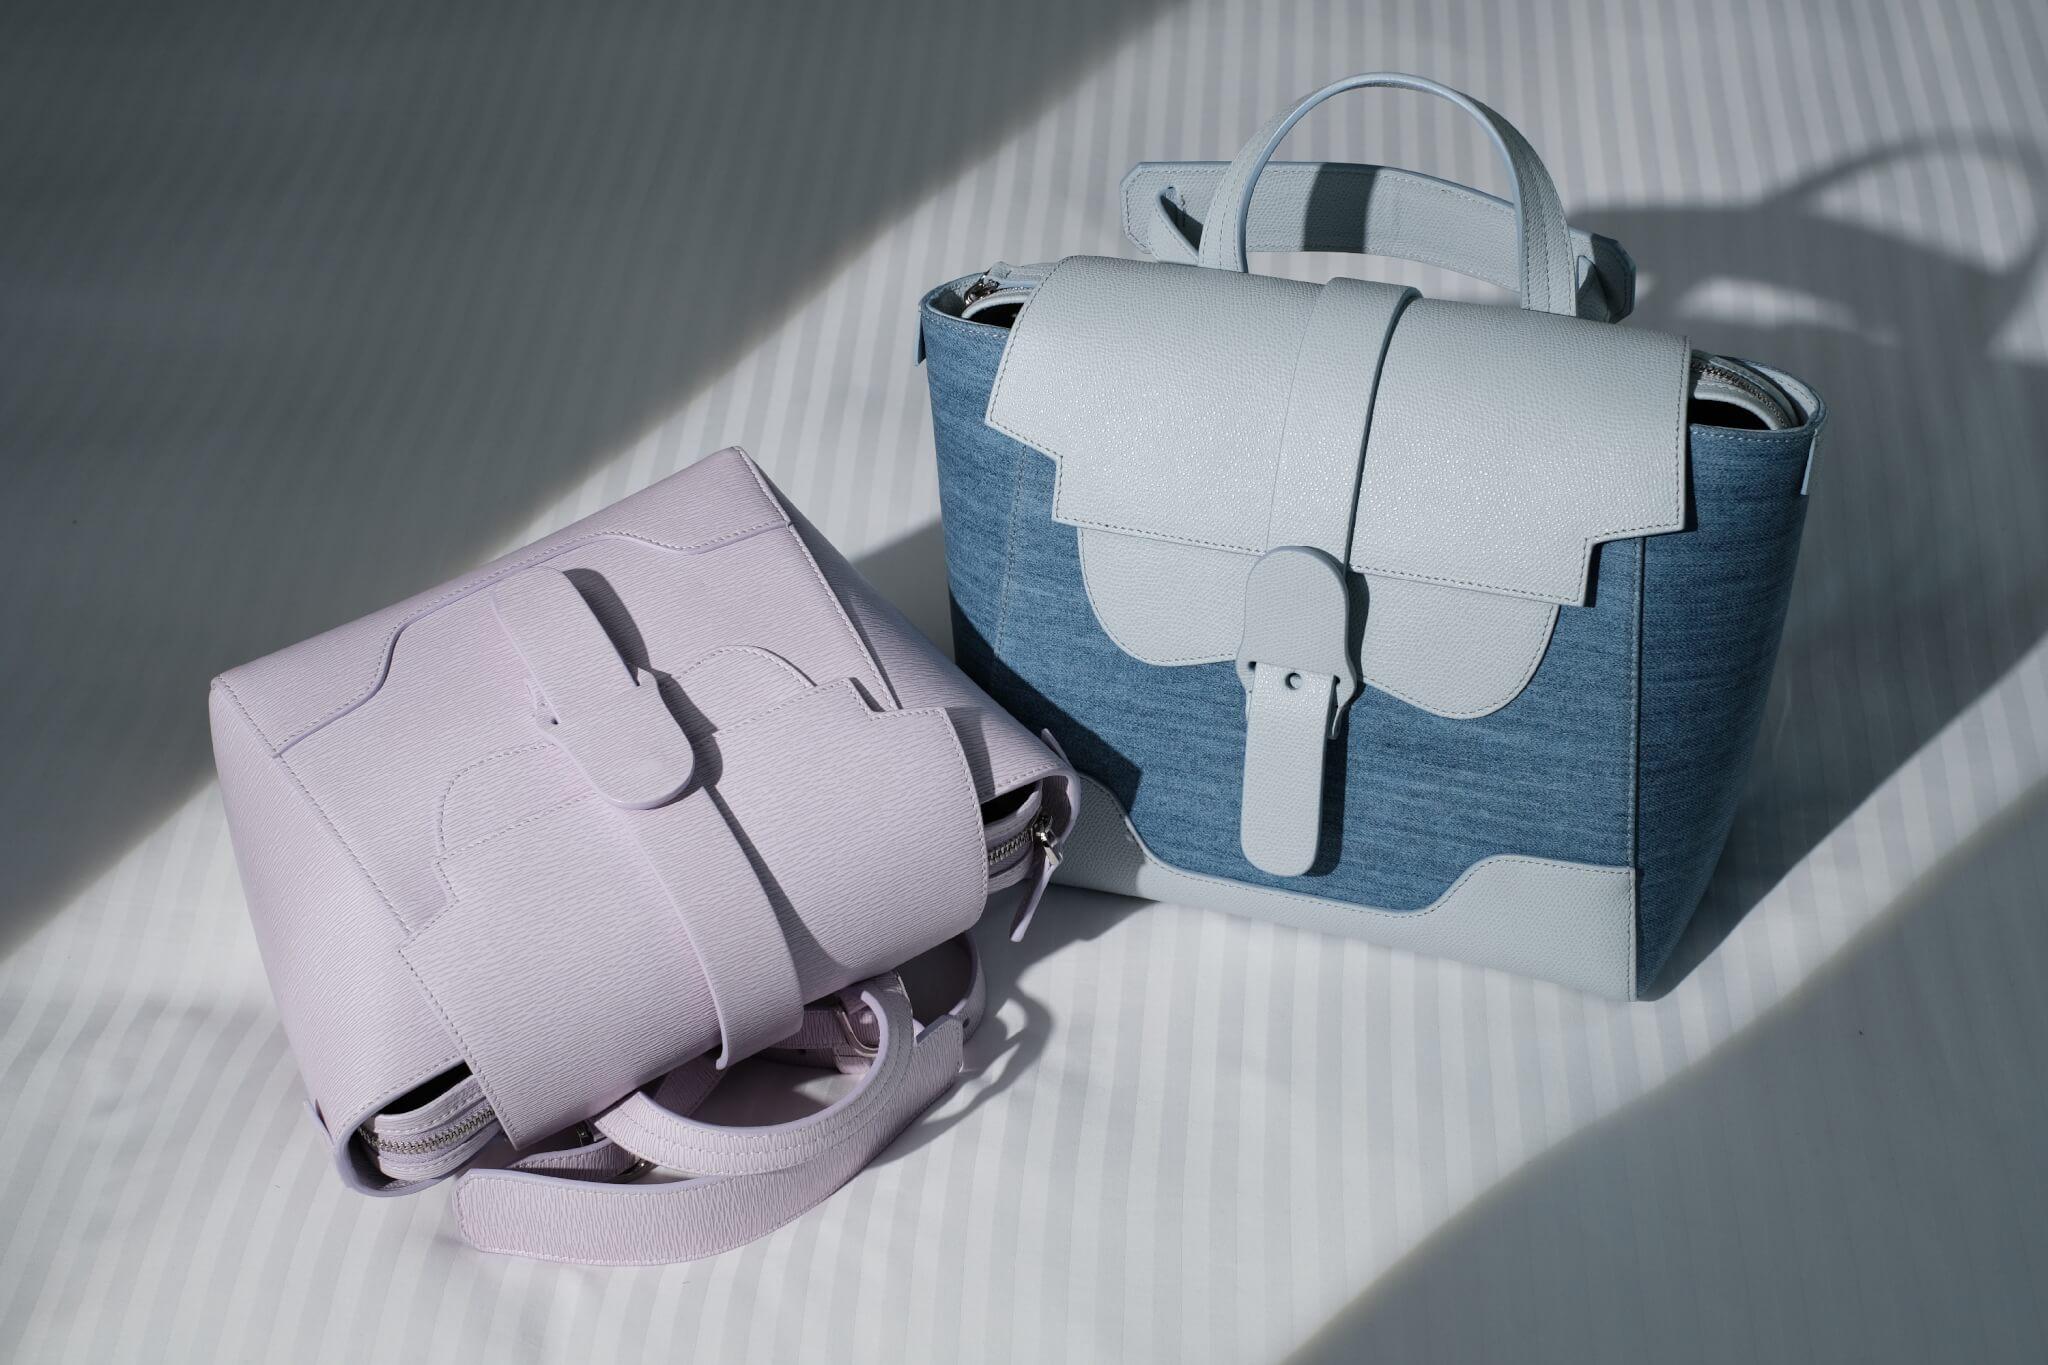 Maestra系列手袋是SENREVE的王牌產品,深受荷李活明星歡迎。